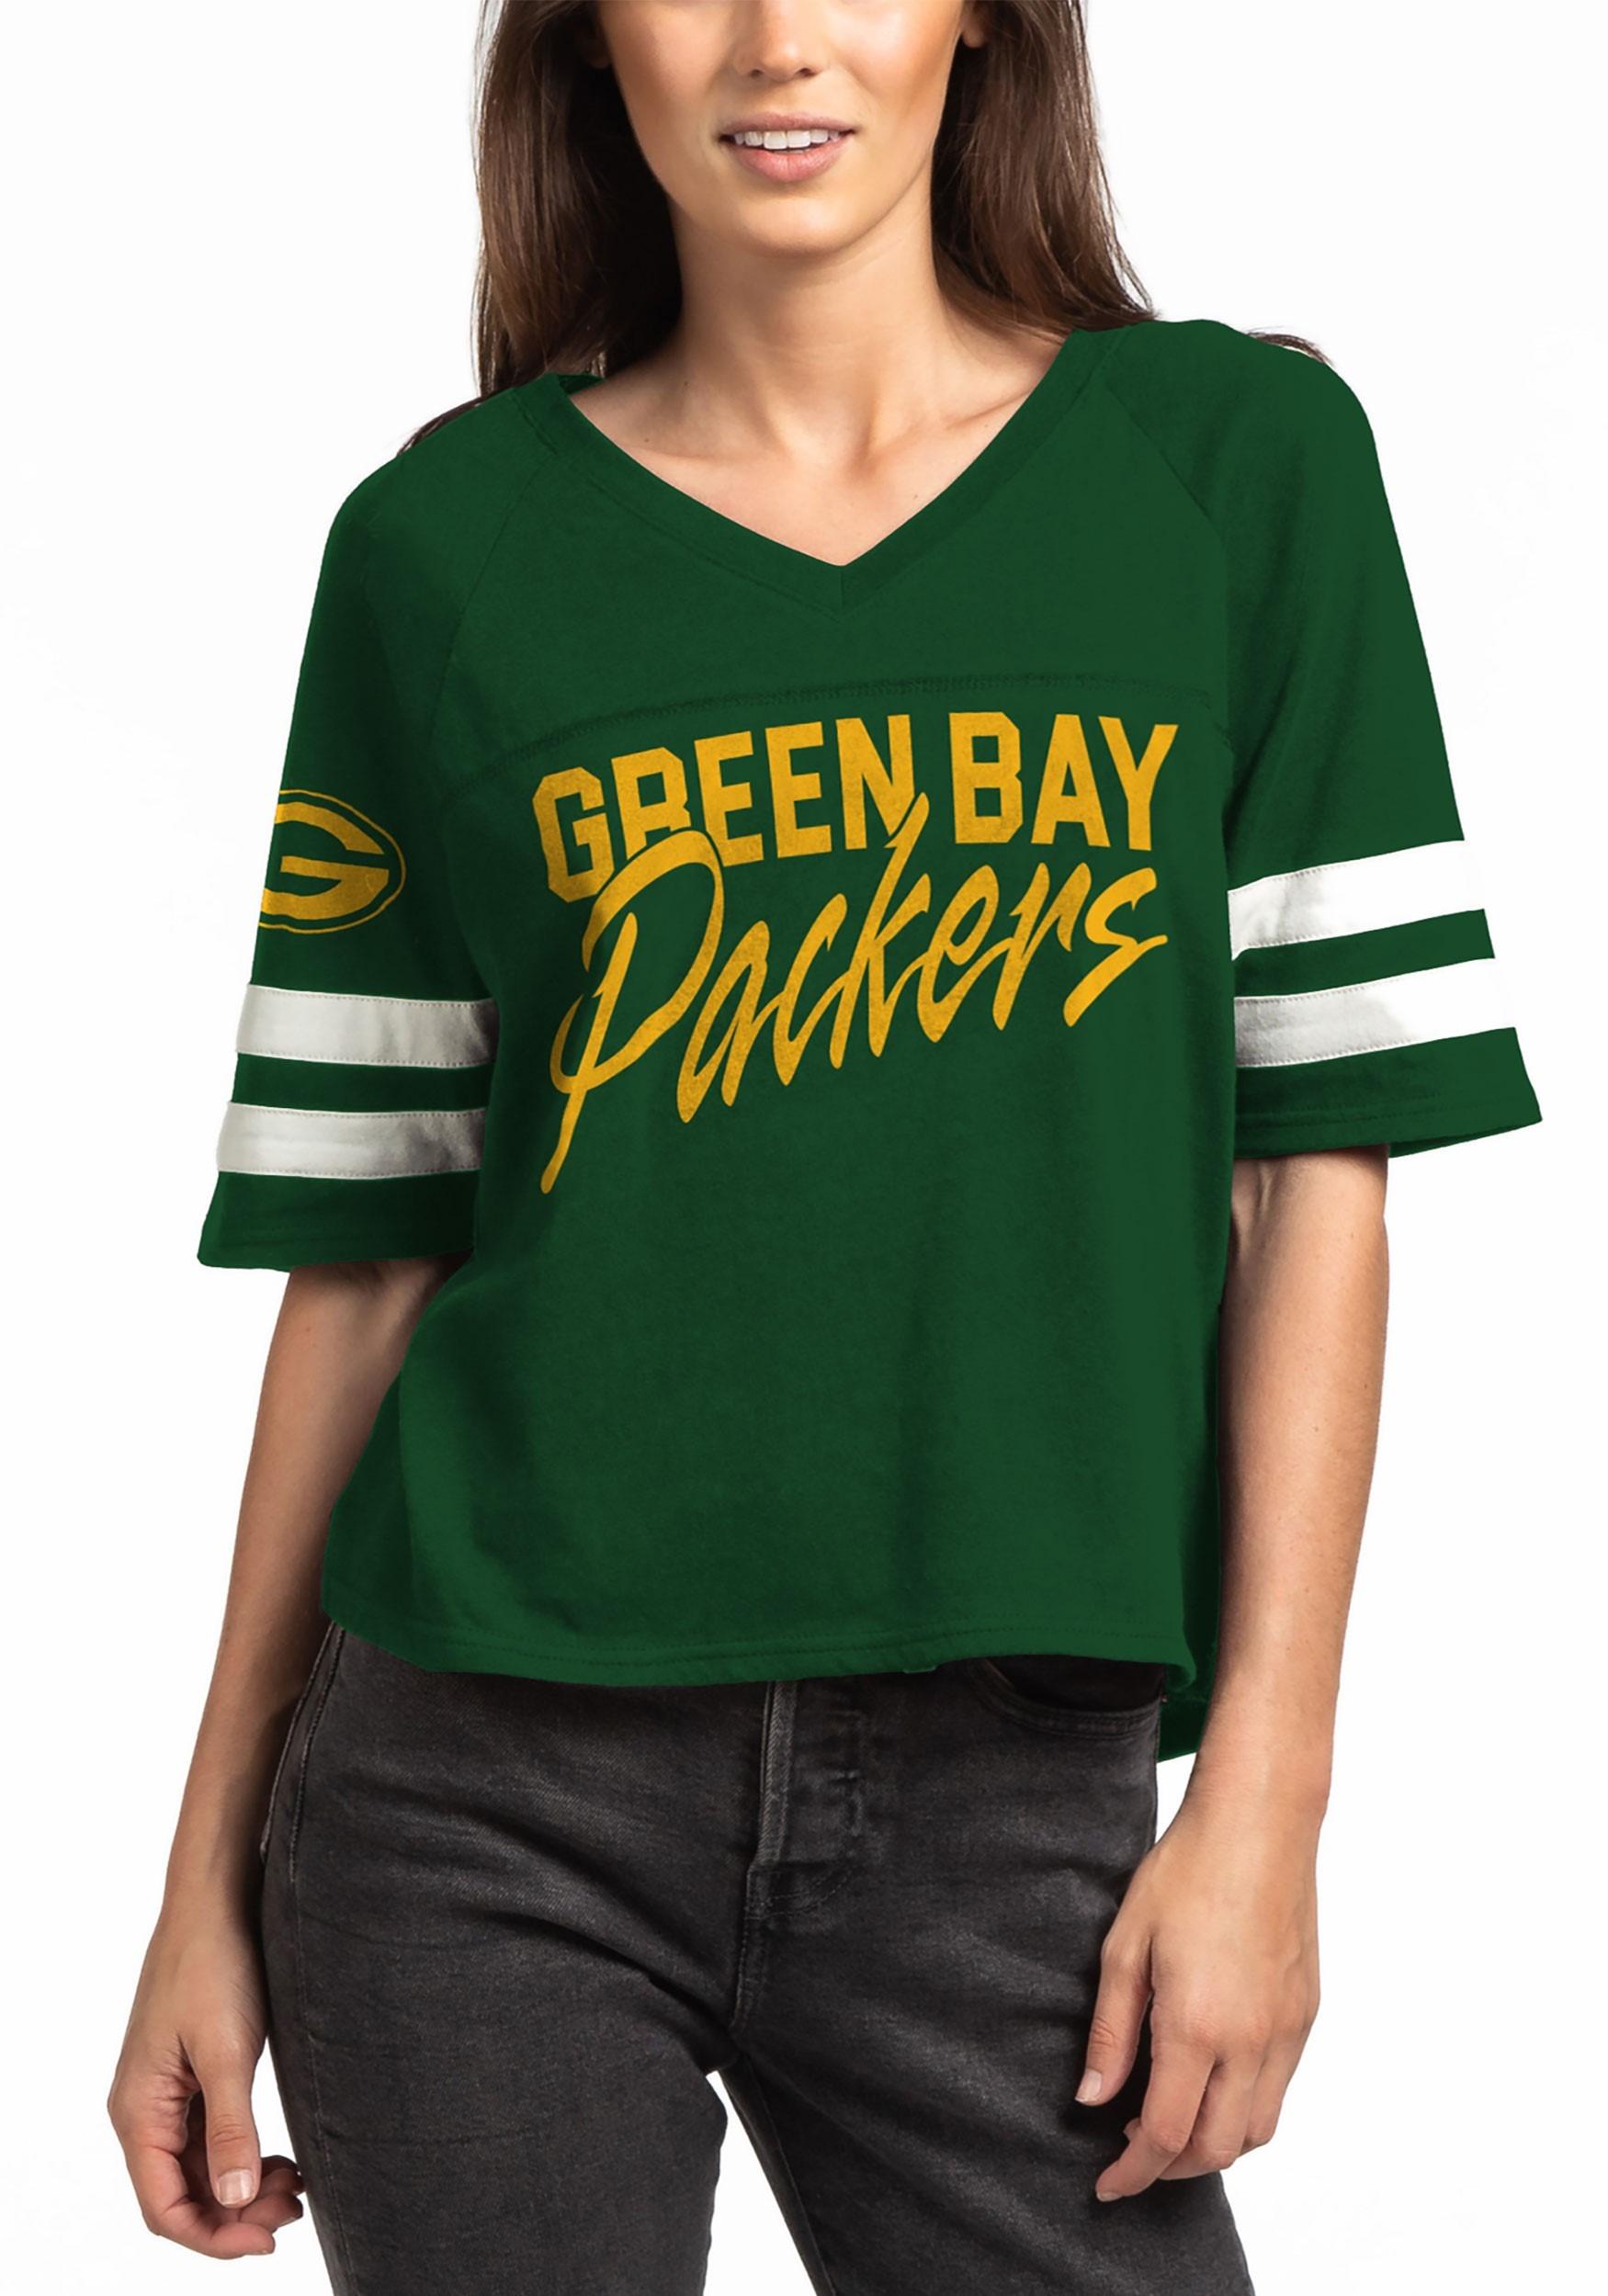 798851a6 Green Bay Packers Womens V-Neck Hunter Green Football Tee